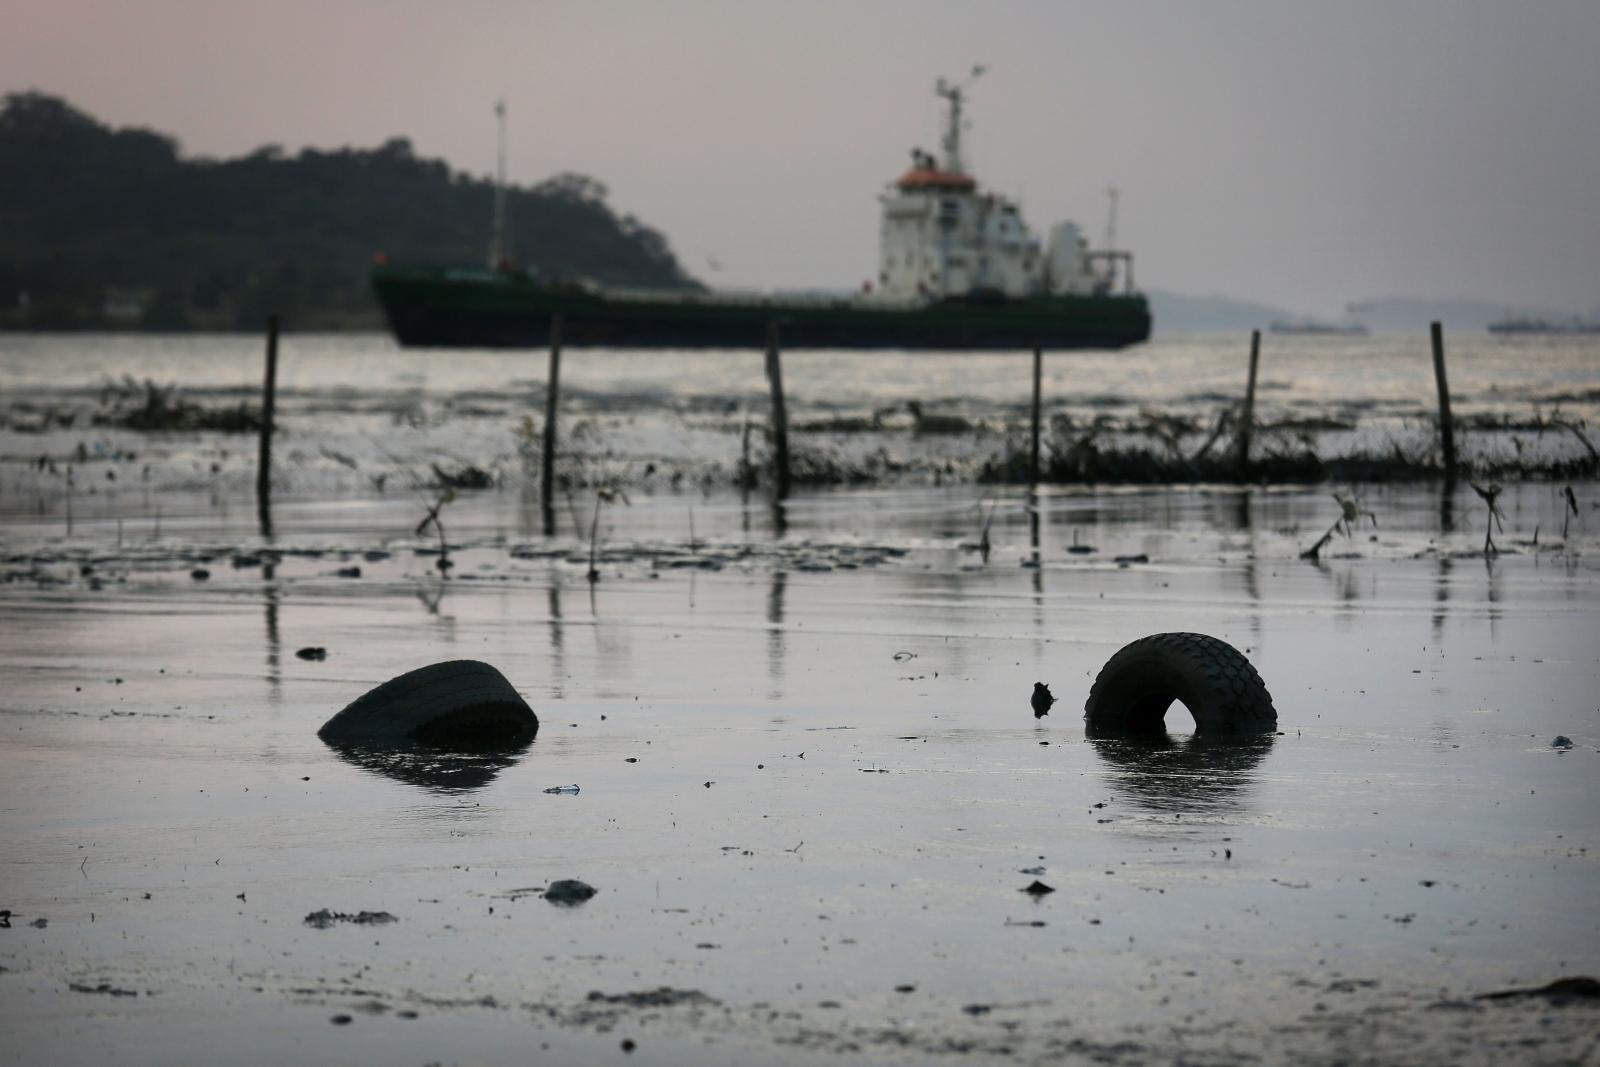 Rio water polution